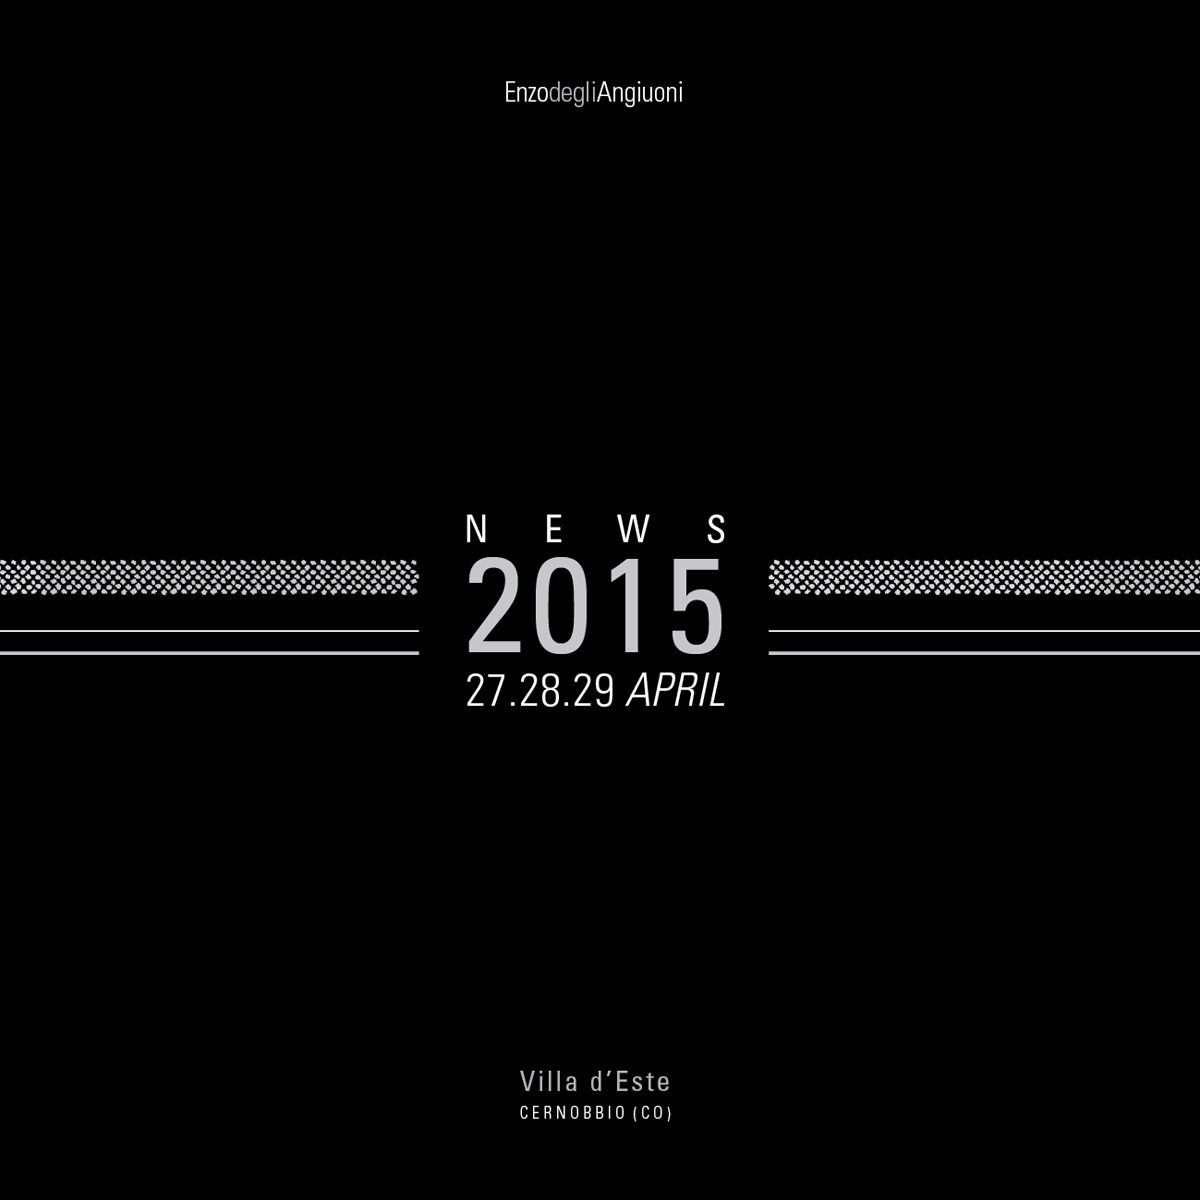 enzo-degli-angiuoni-news-2015-save-the-date